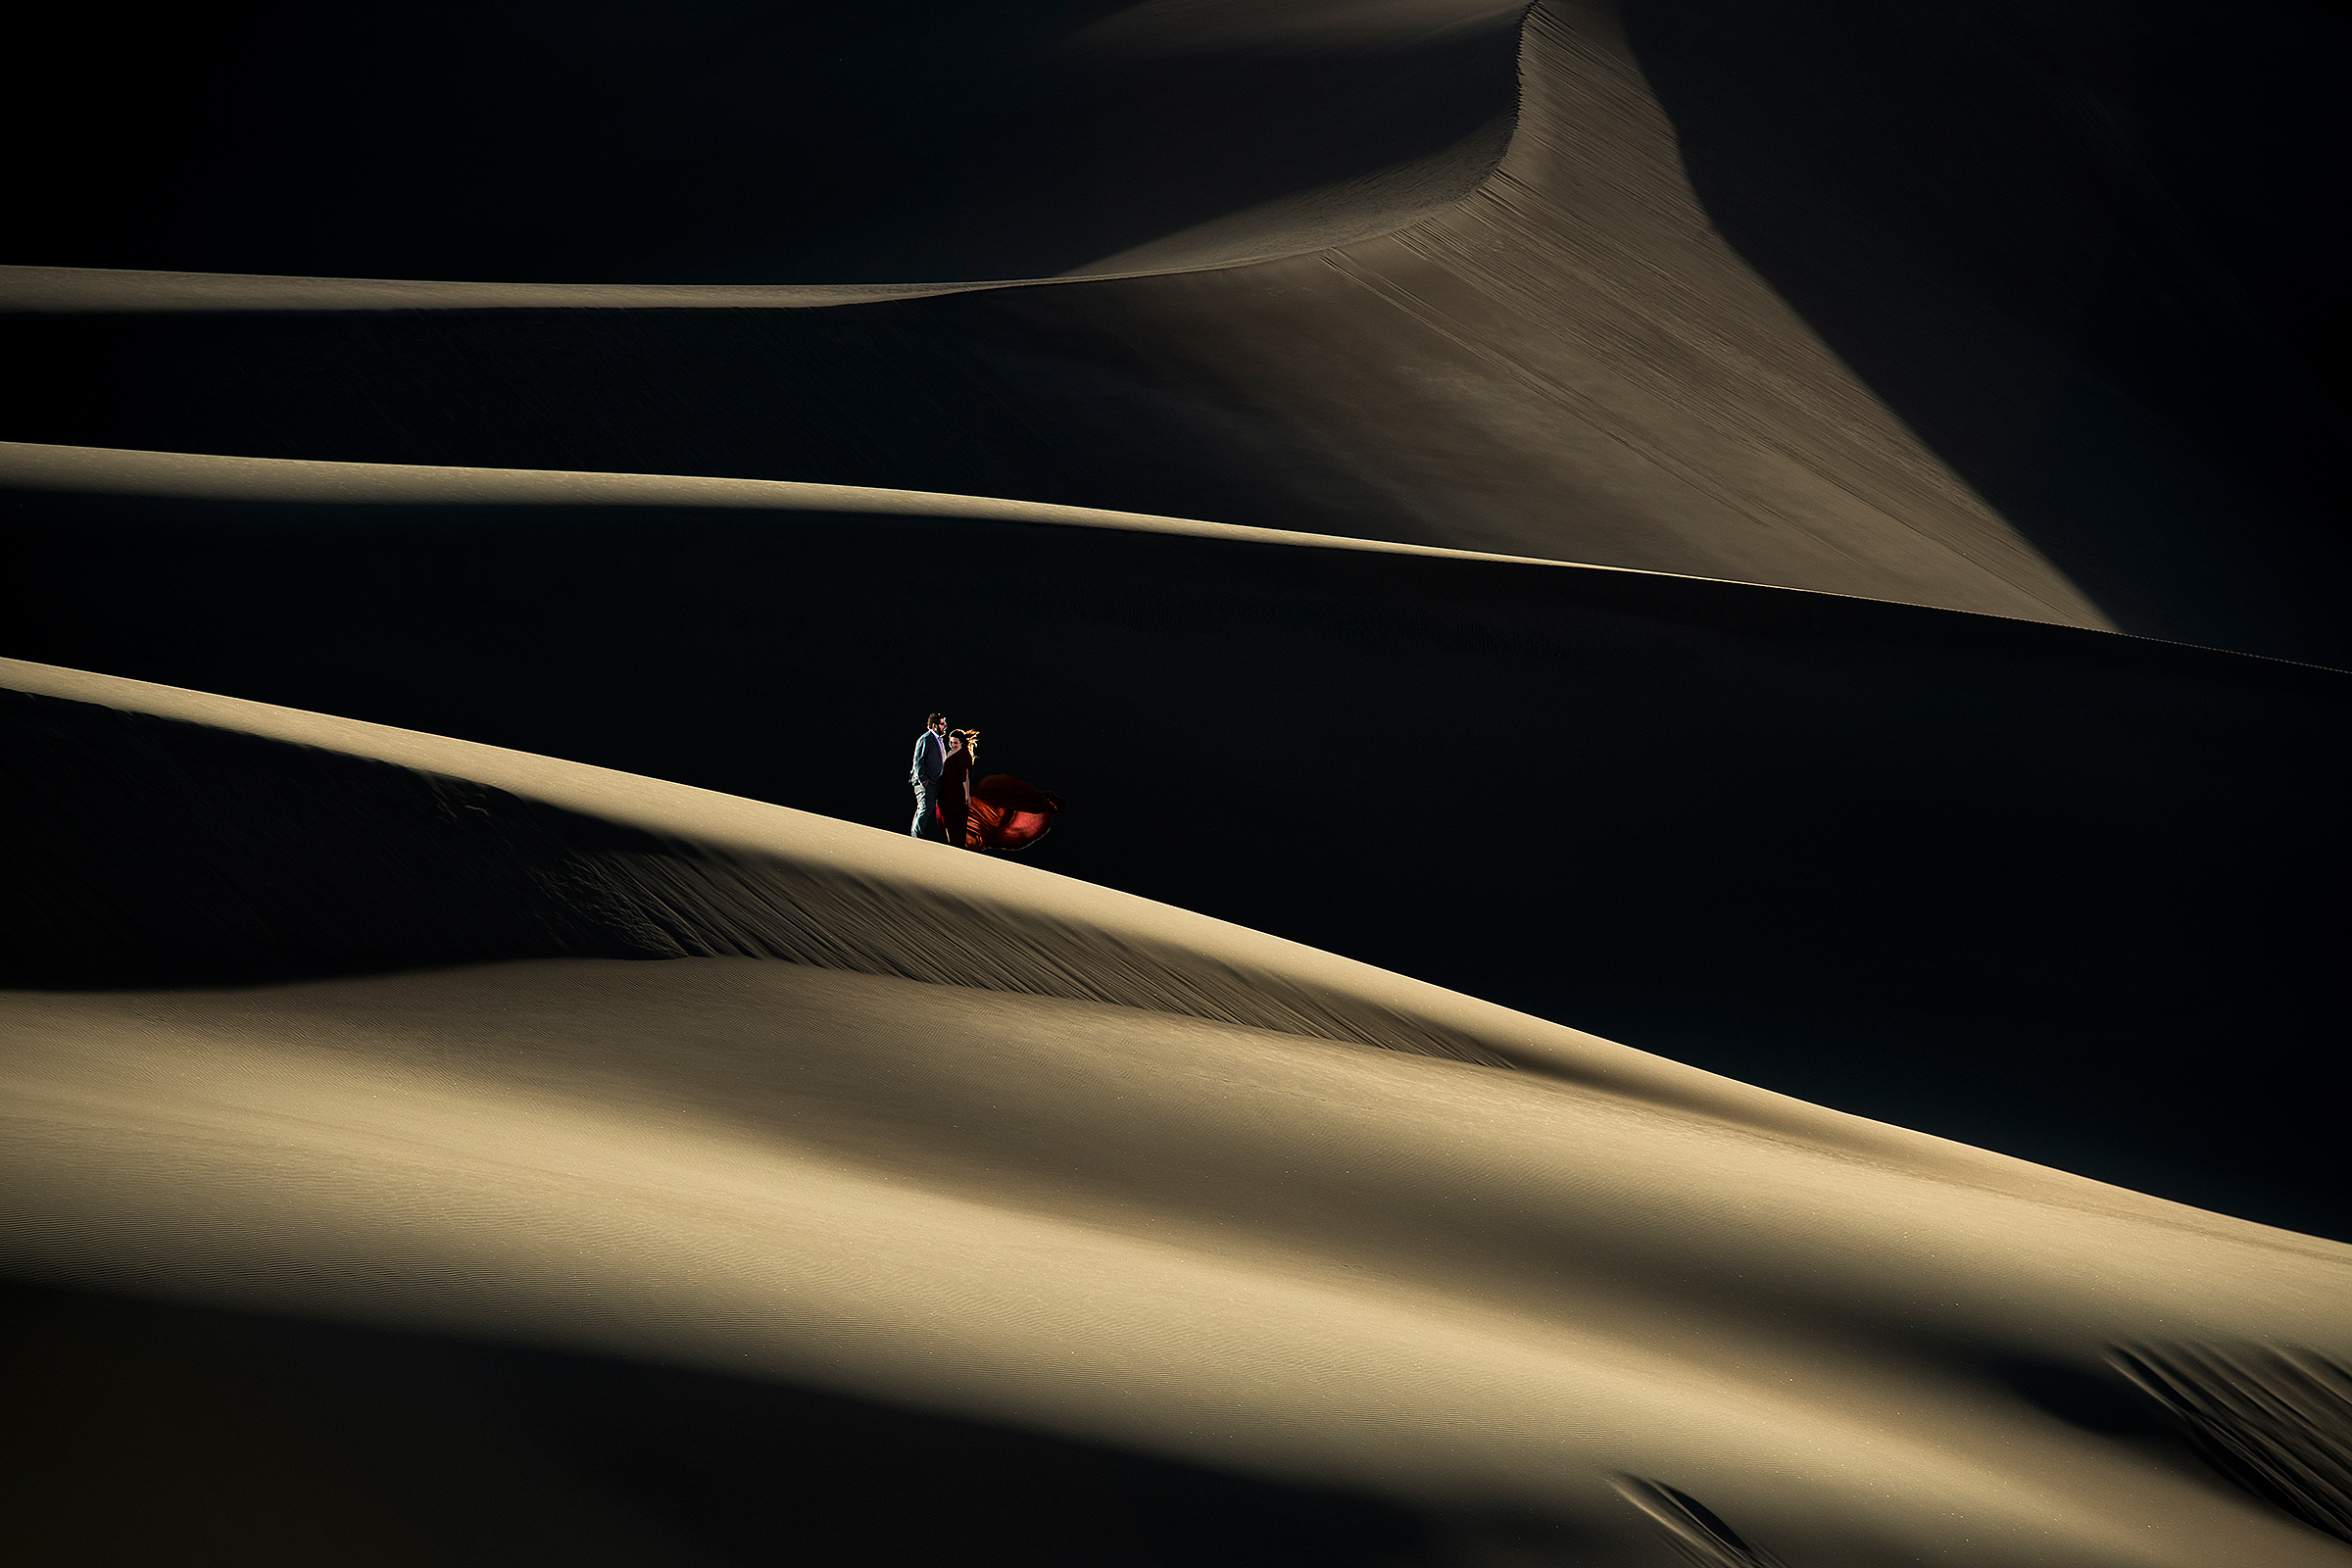 bride-and-groom-in-desert-photo-by-j-la-plante-photo